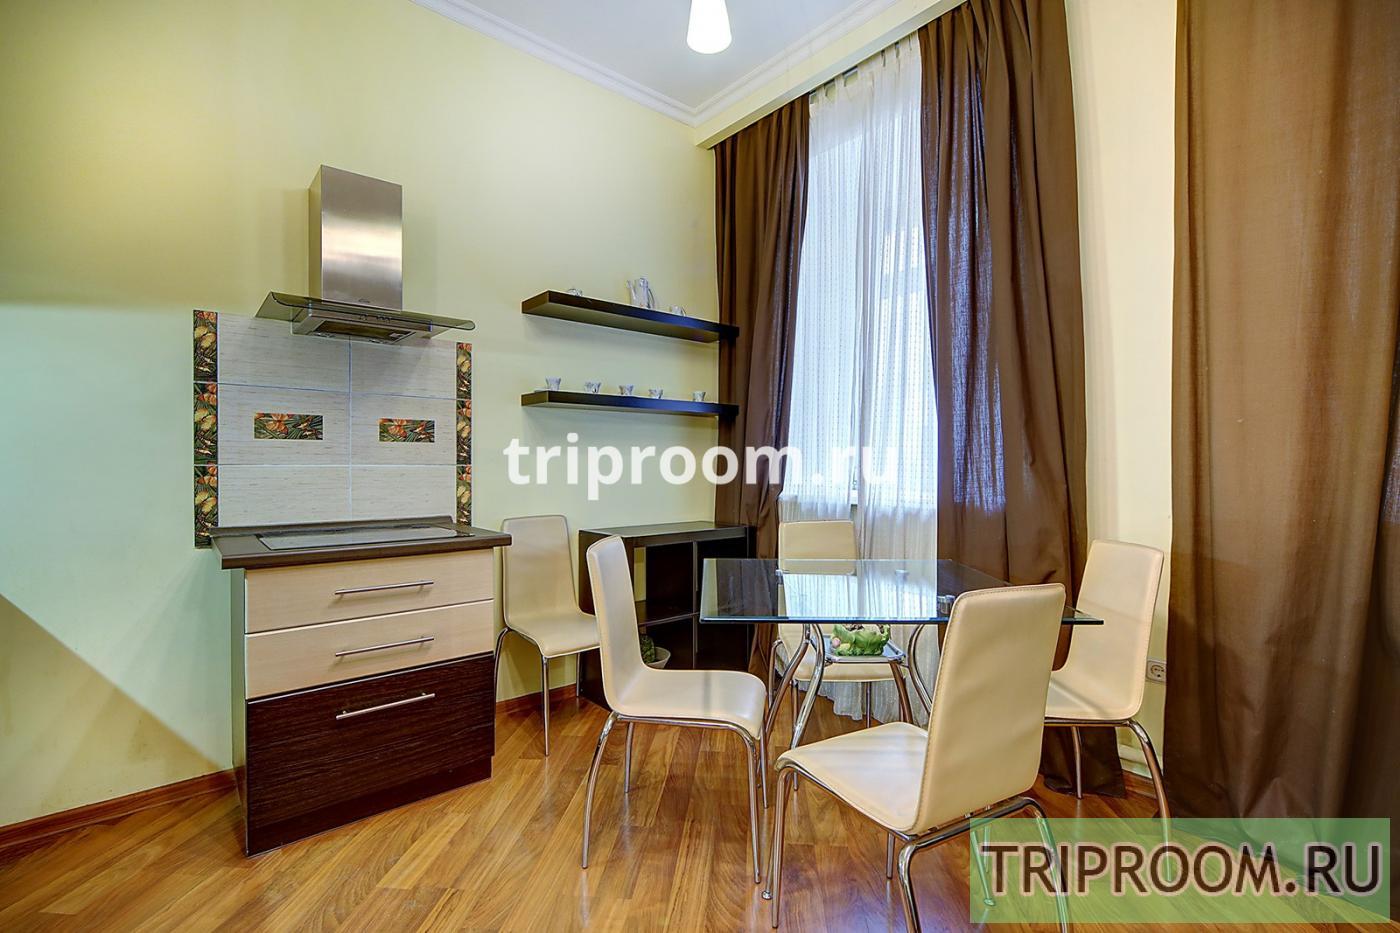 1-комнатная квартира посуточно (вариант № 15117), ул. Канала Грибоедова набережная, фото № 10